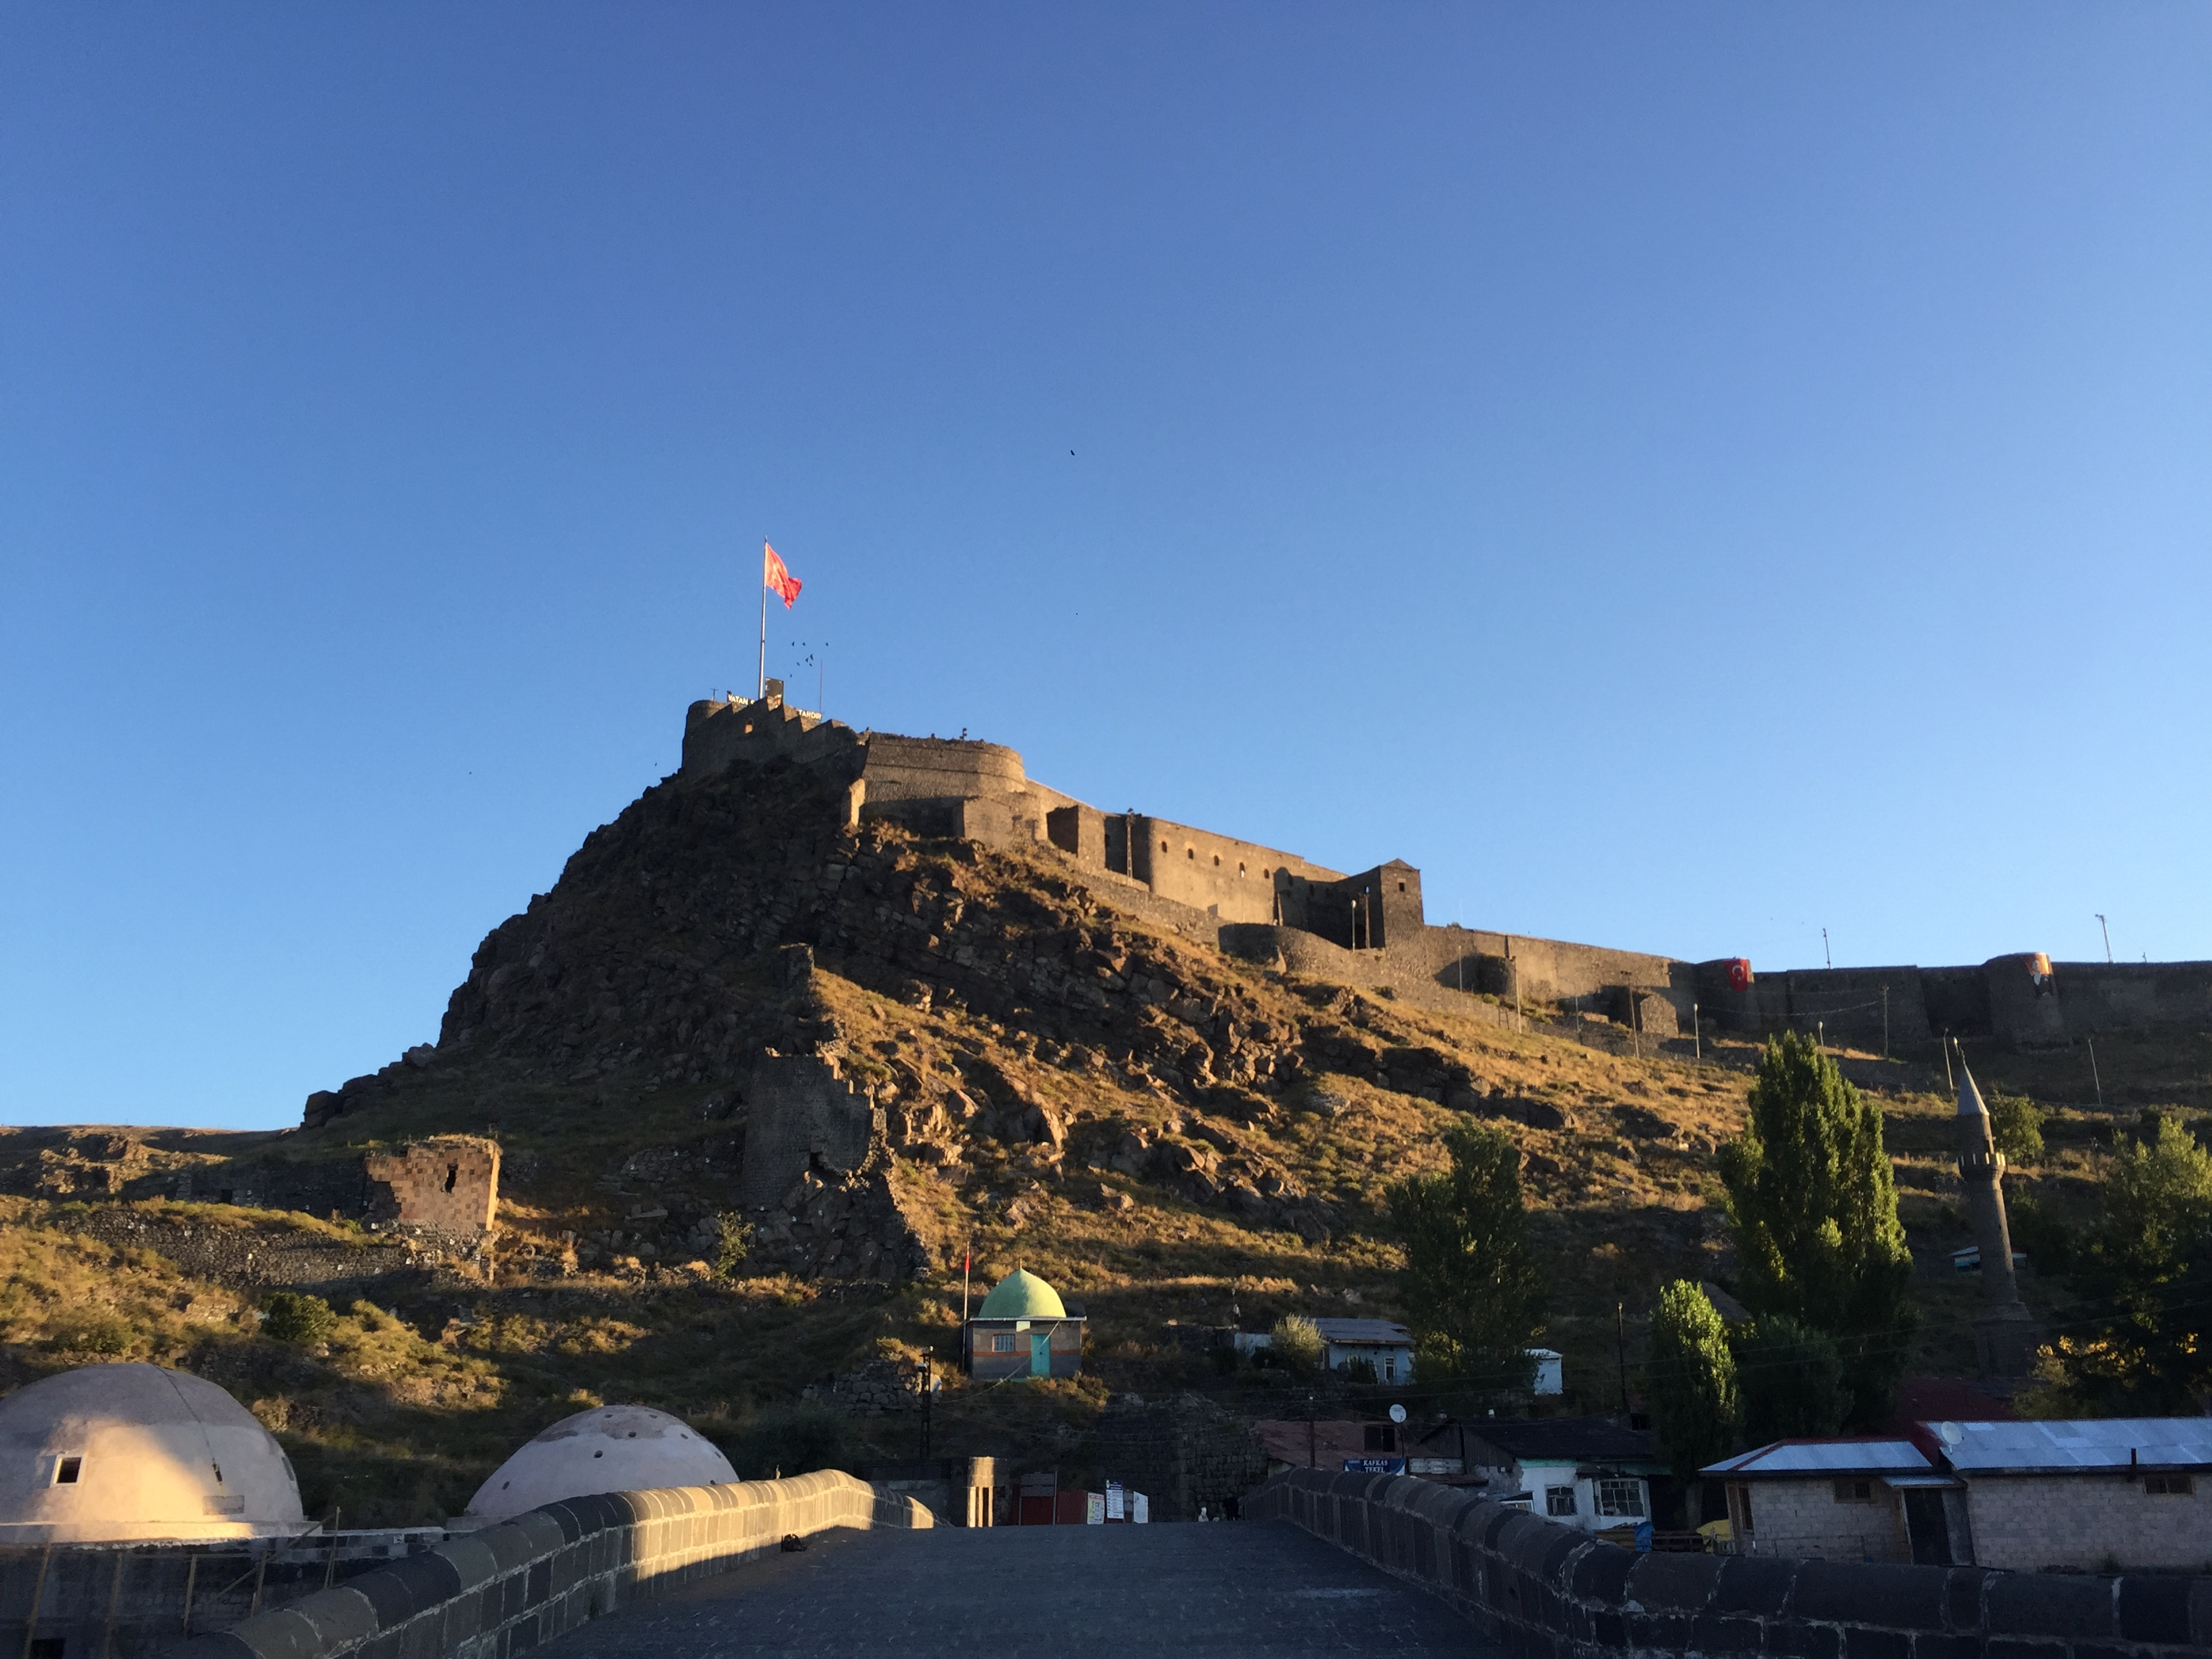 Kars castle in the morning light as we leave town